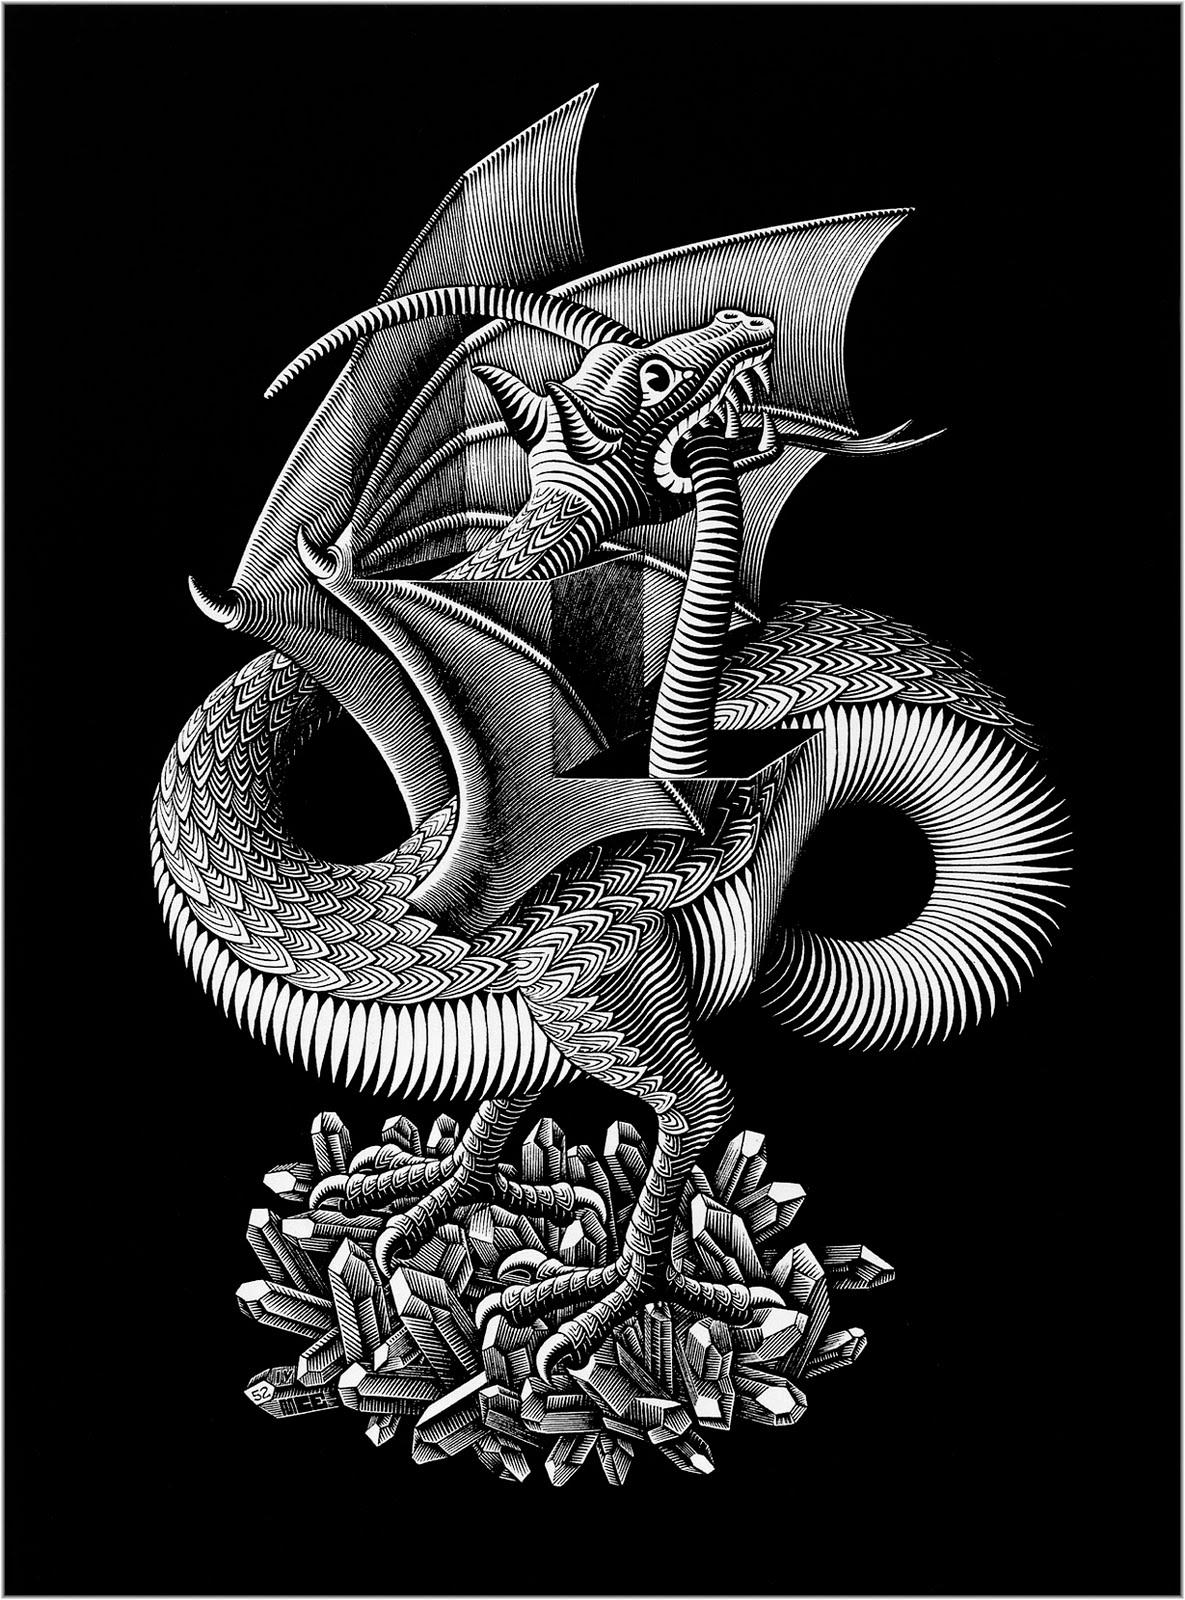 http://4.bp.blogspot.com/_OMqpMZWW_ik/TJadPcS6eRI/AAAAAAAAAOQ/C1aiY_x8RGs/s1600/Classic+fantasy+wallpaper+-+M+C+Escher+Dragon.jpg